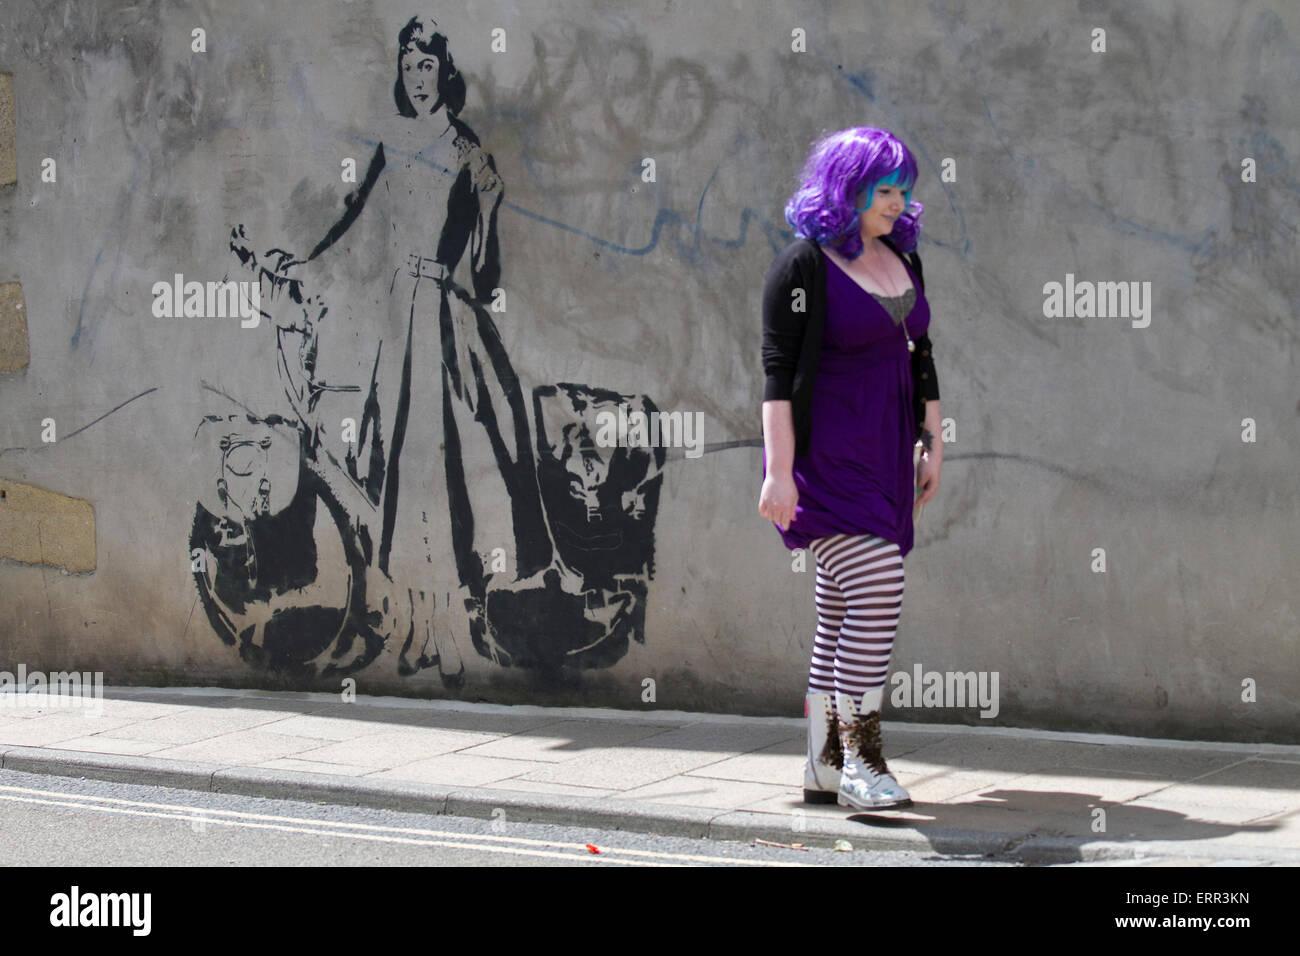 Sylvia walker stockfotos sylvia walker bilder alamy - Schablone wandmalerei ...